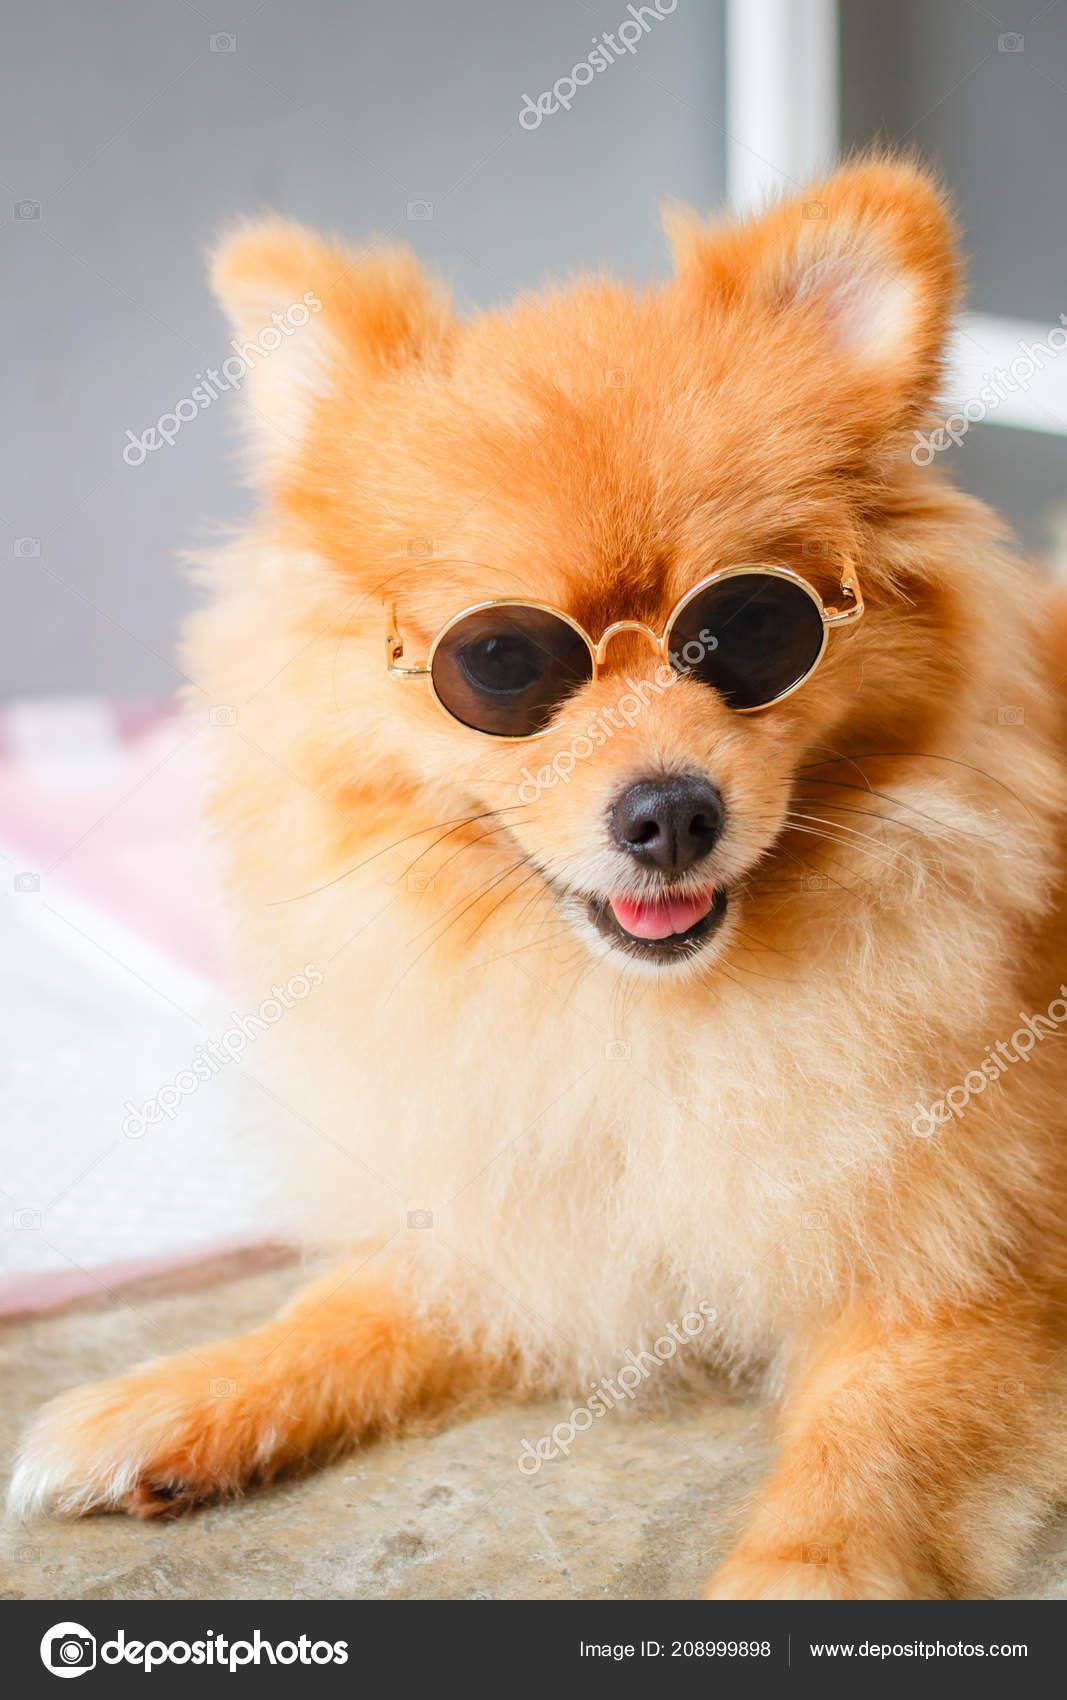 Pomeranian Dog Smile Cute Beautiful Pomeranian Dog Stock Photo C Tachjang 208999898